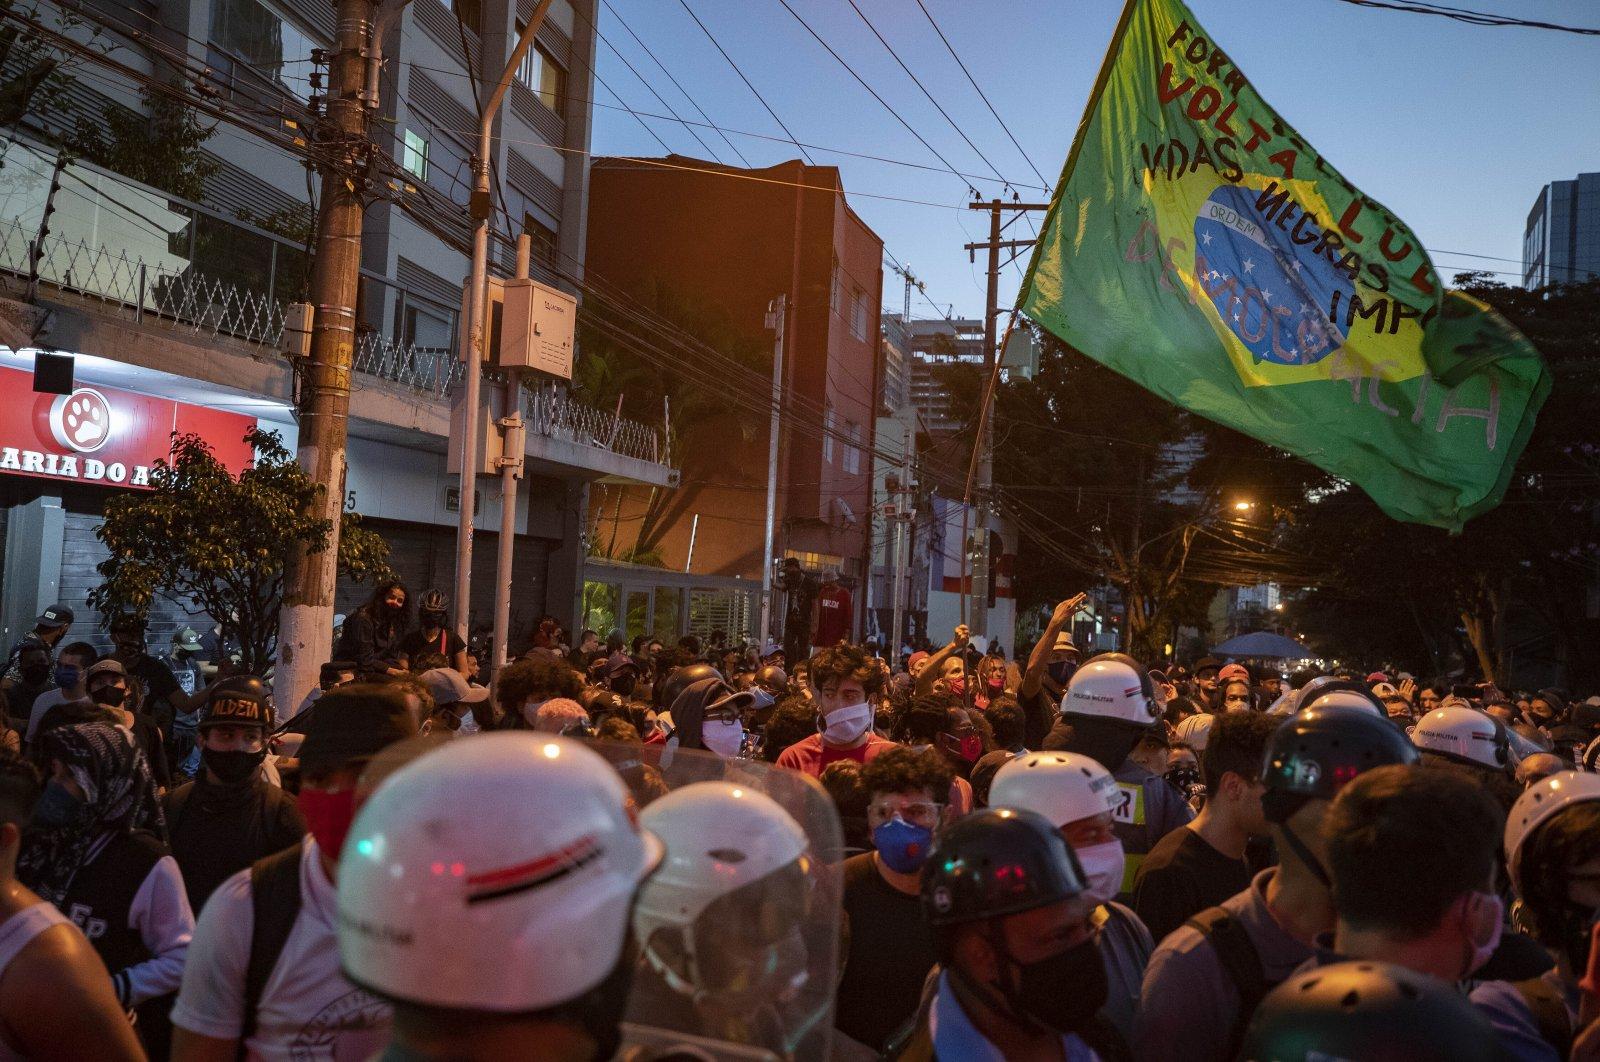 Demonstrators protest against racism and Brazilian president Jair Bolsonaroand in Sao Paulo, Brazil, Sunday, June 7, 2020. (AP Photo/Andre Penner)